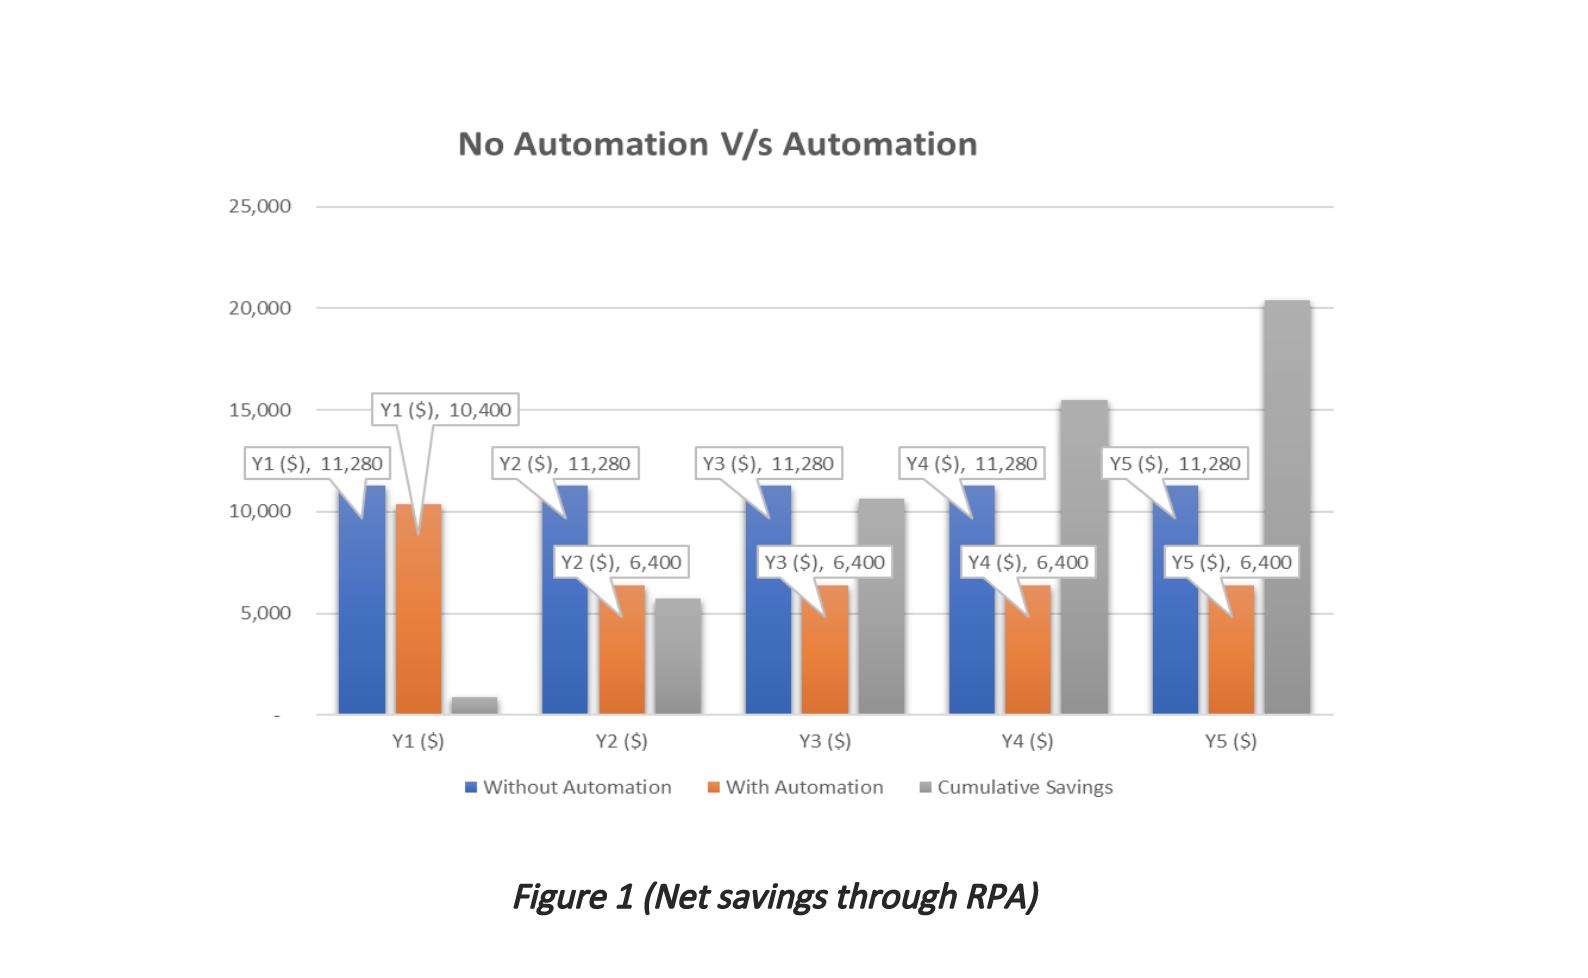 Figure 1 (Net savings through RPA)